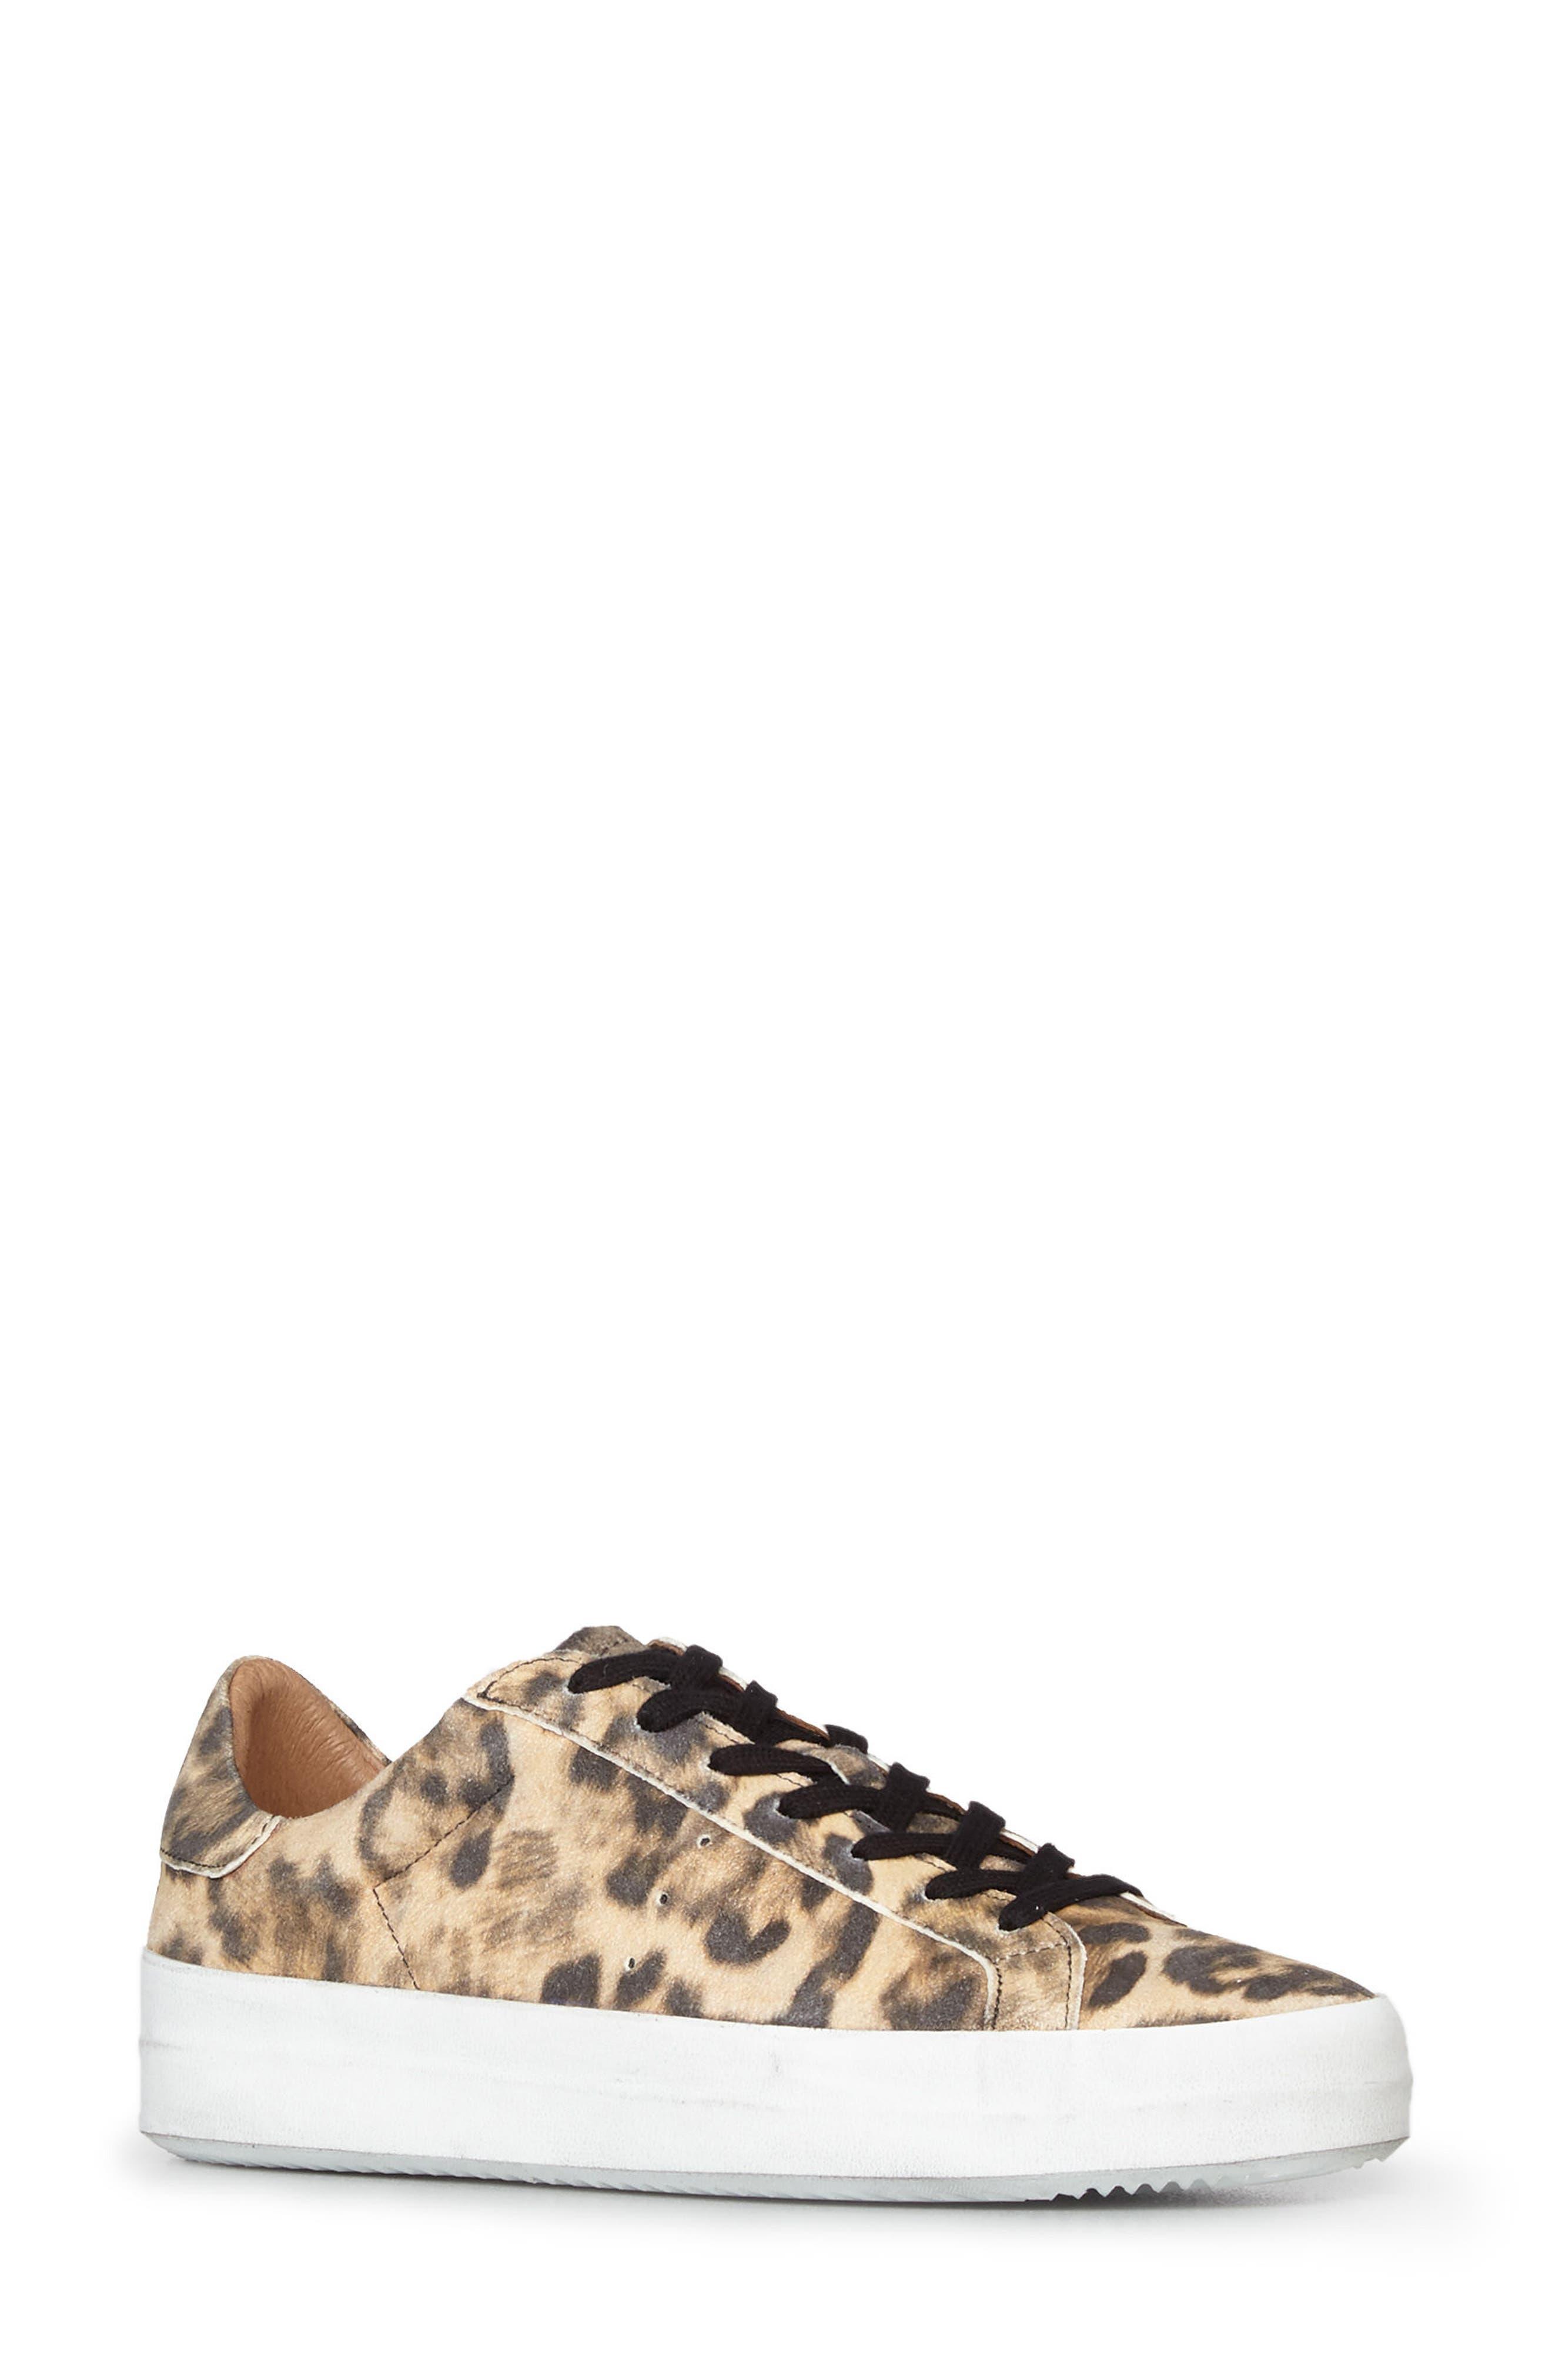 Alternate Image 1 Selected - ALLSAINTS Safia Sneaker (Women)